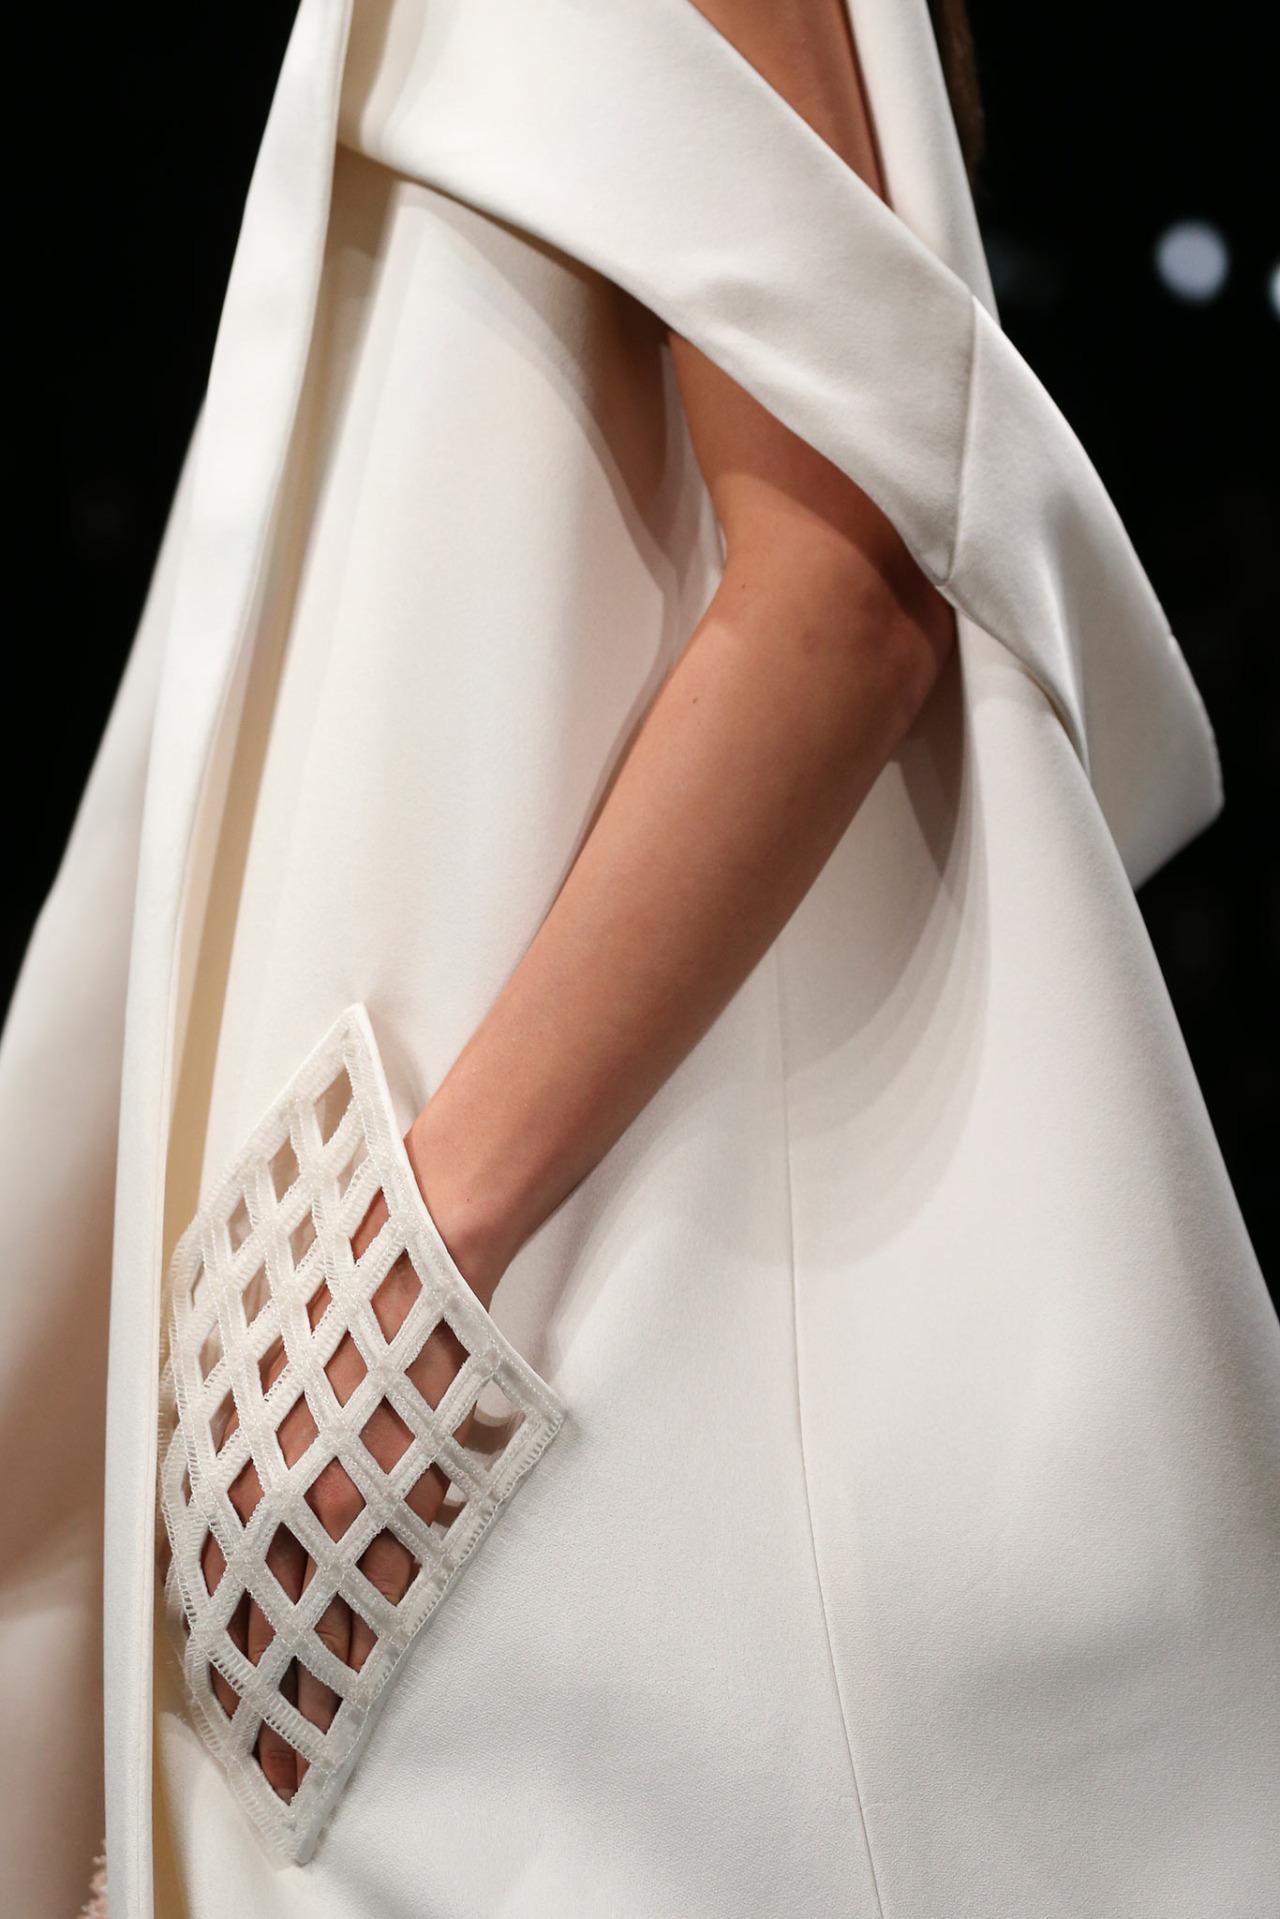 girlannachronism :     Balenciaga spring 2015 rtw details